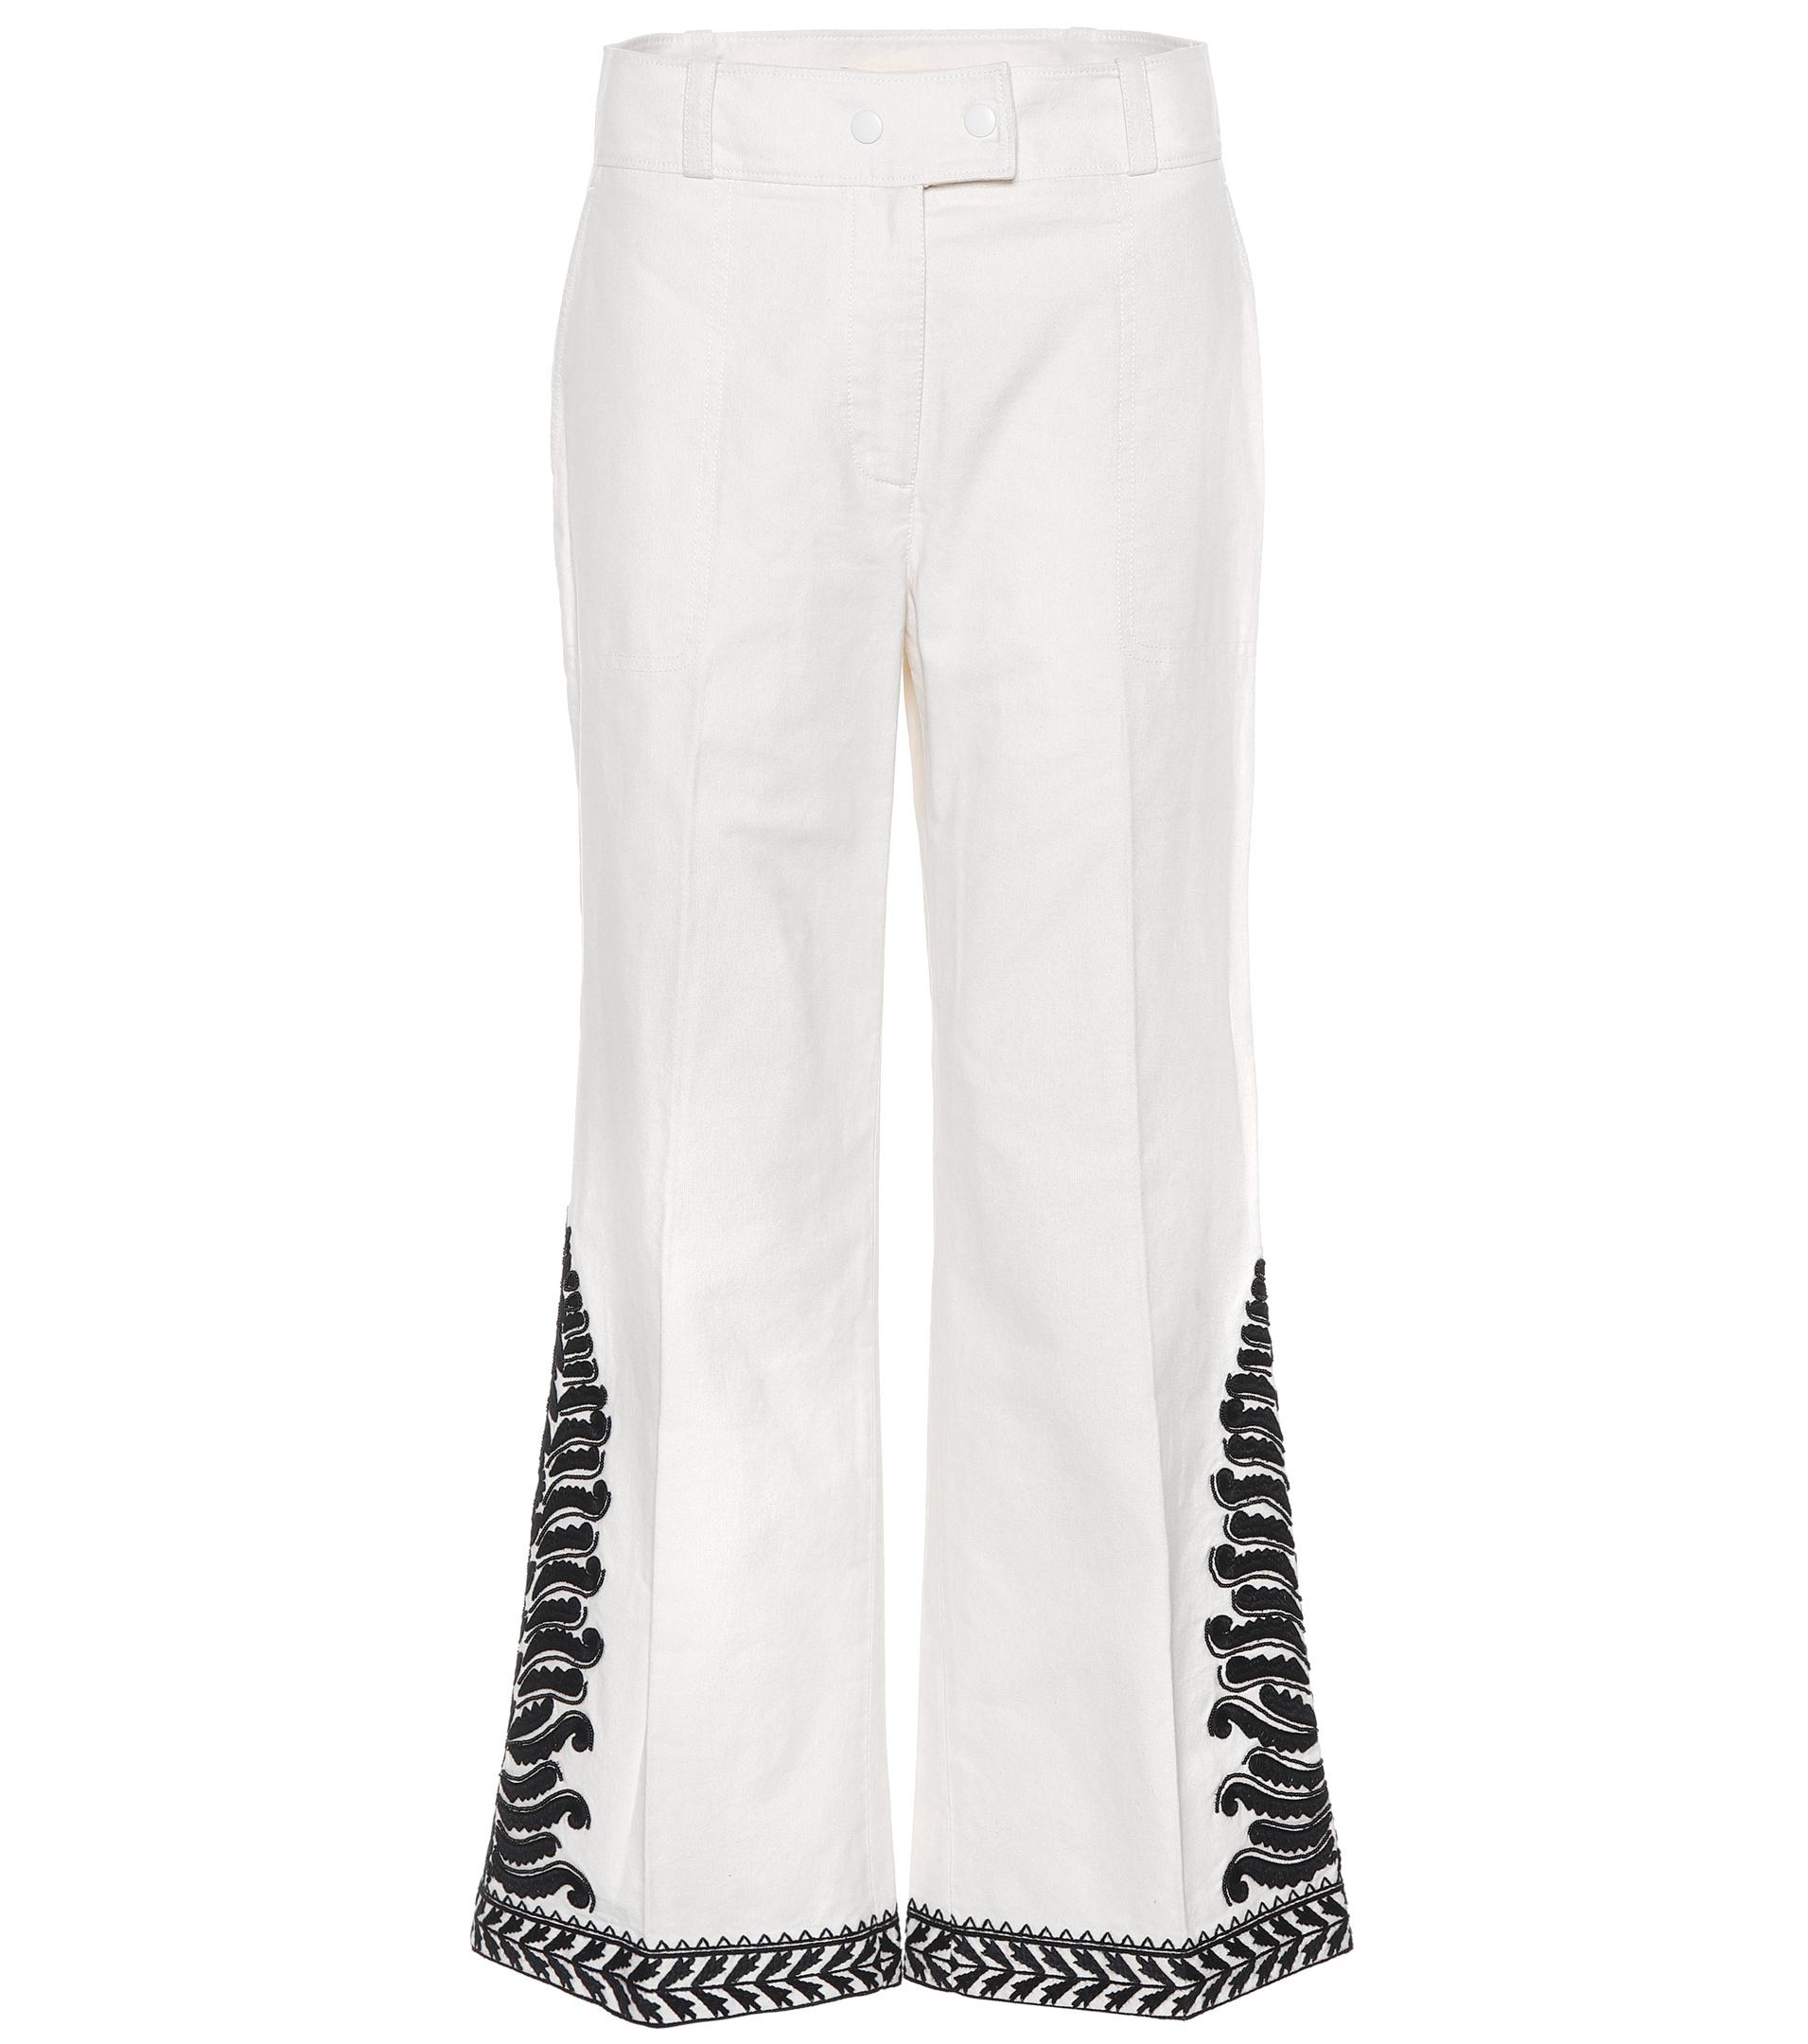 Pantalon en coton brodéTory Burch Confortable En Ligne YlgsMygOof